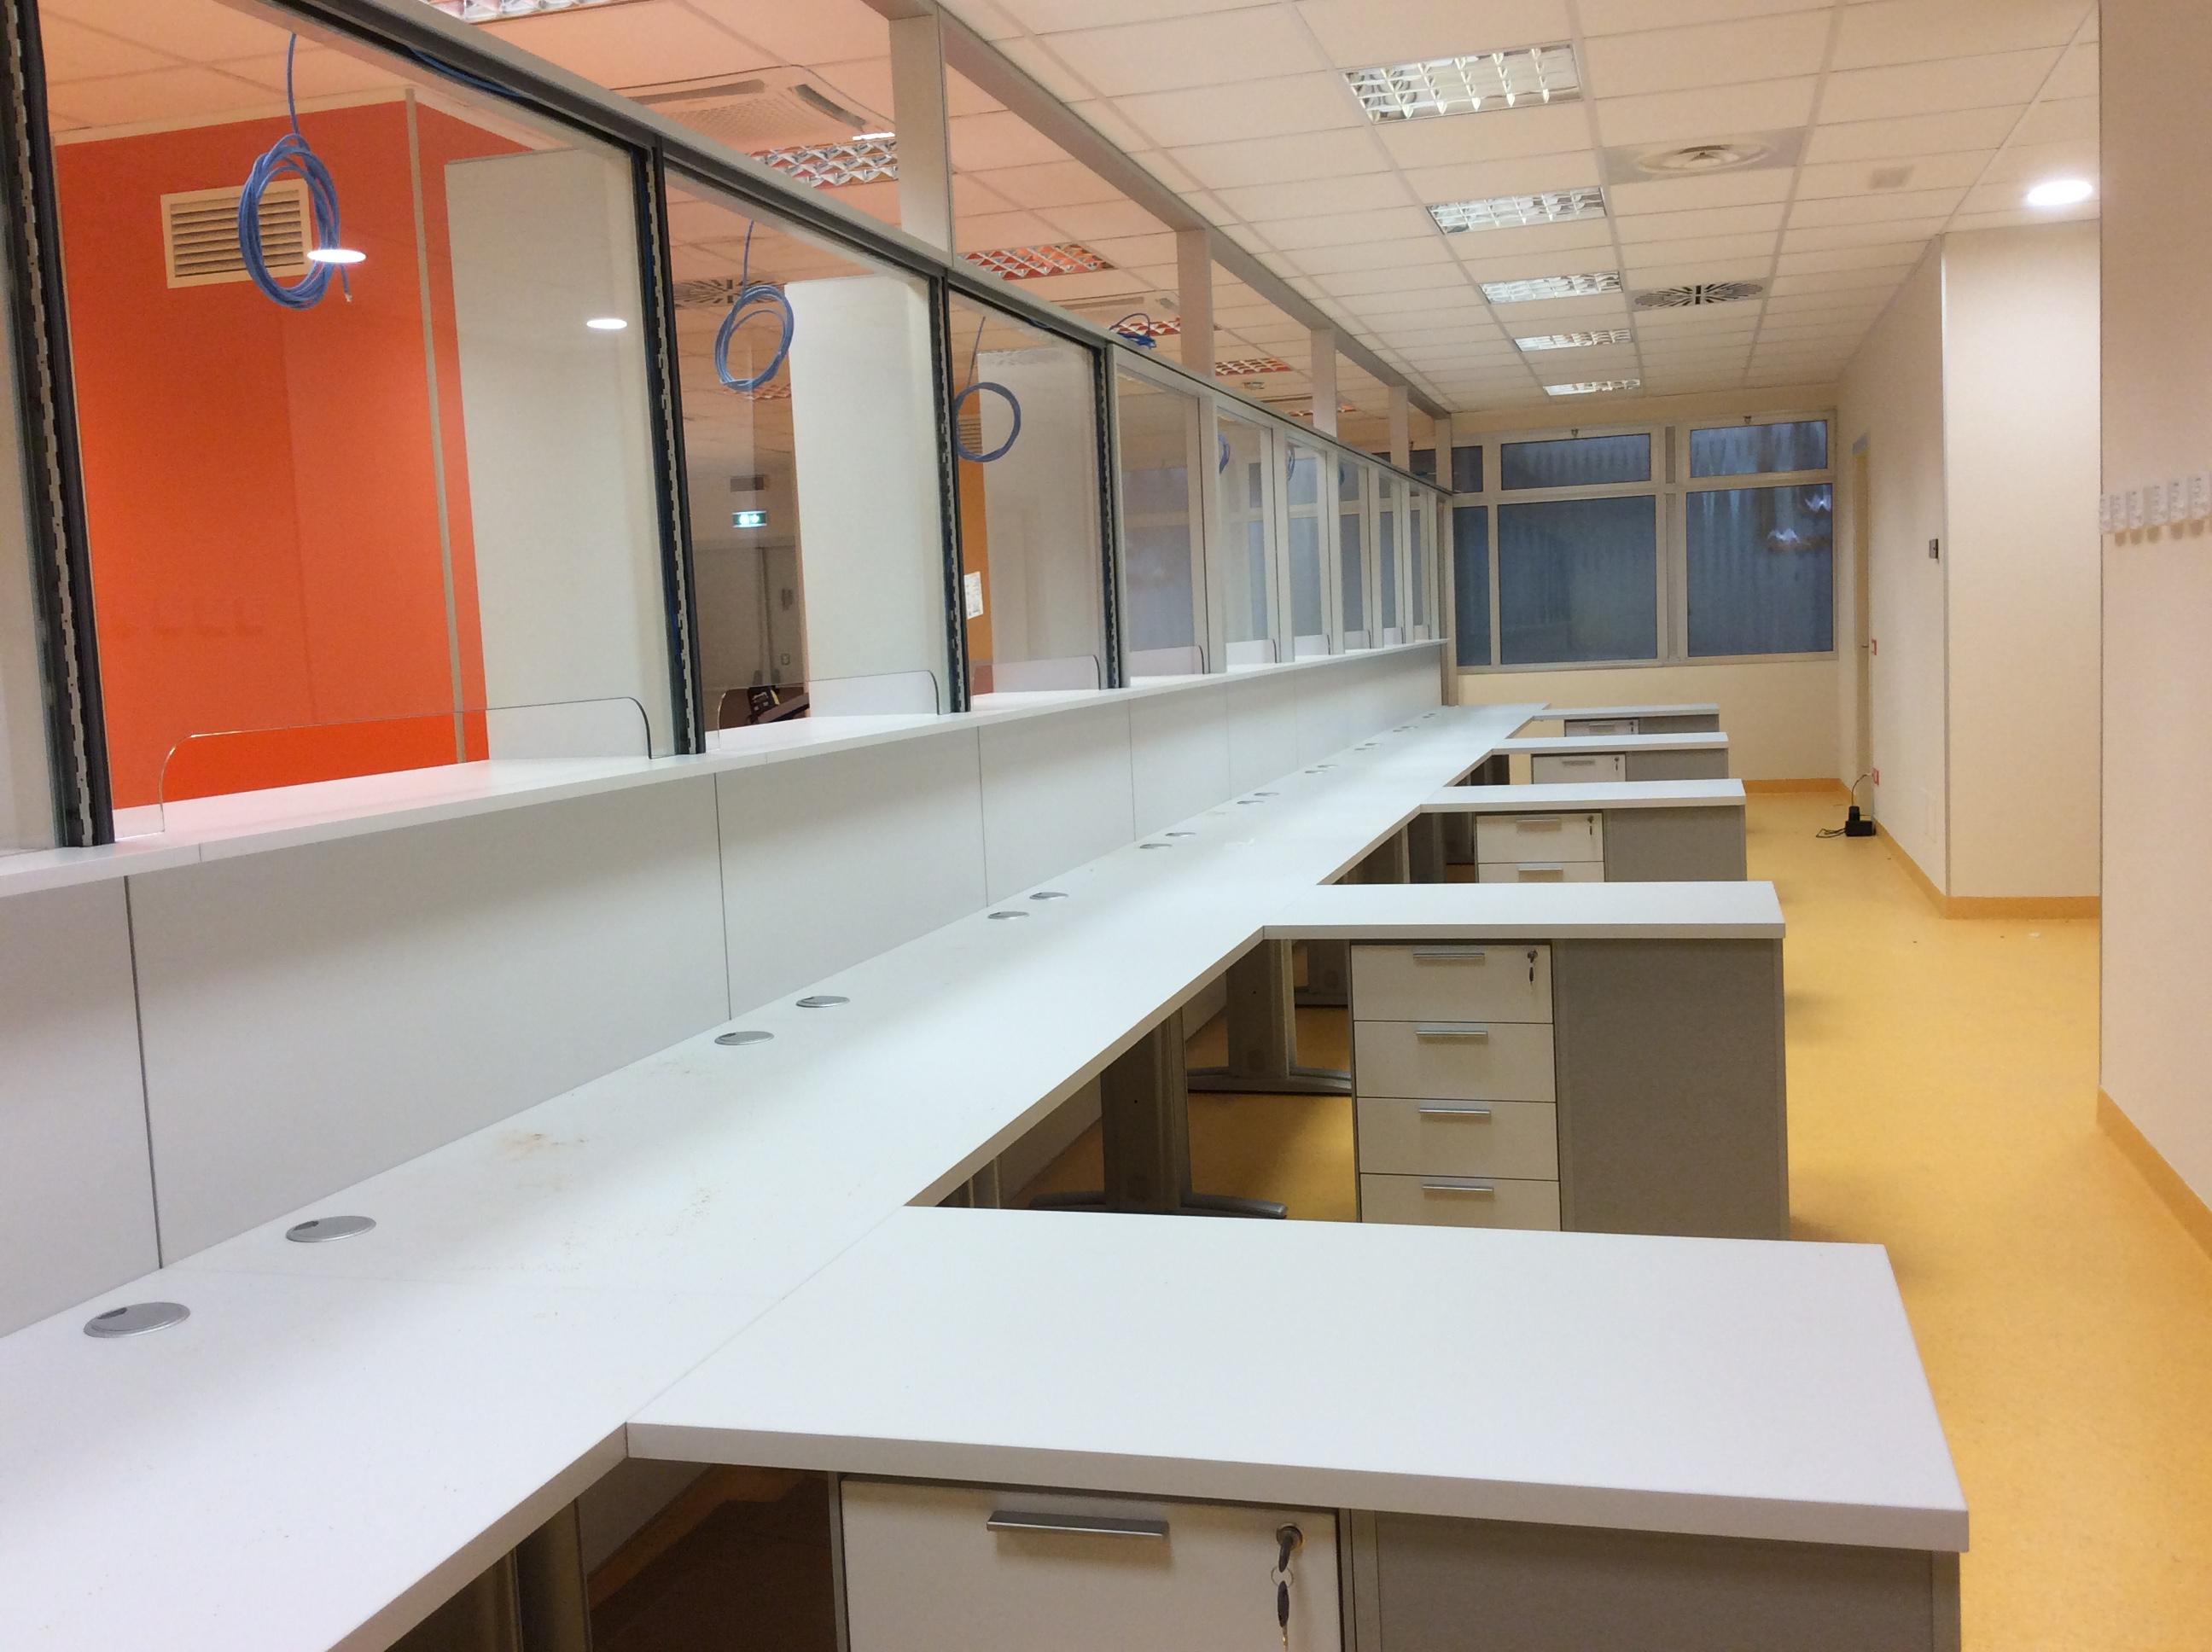 24 Uffici accettazione sportelli - Riganelli Arredamenti